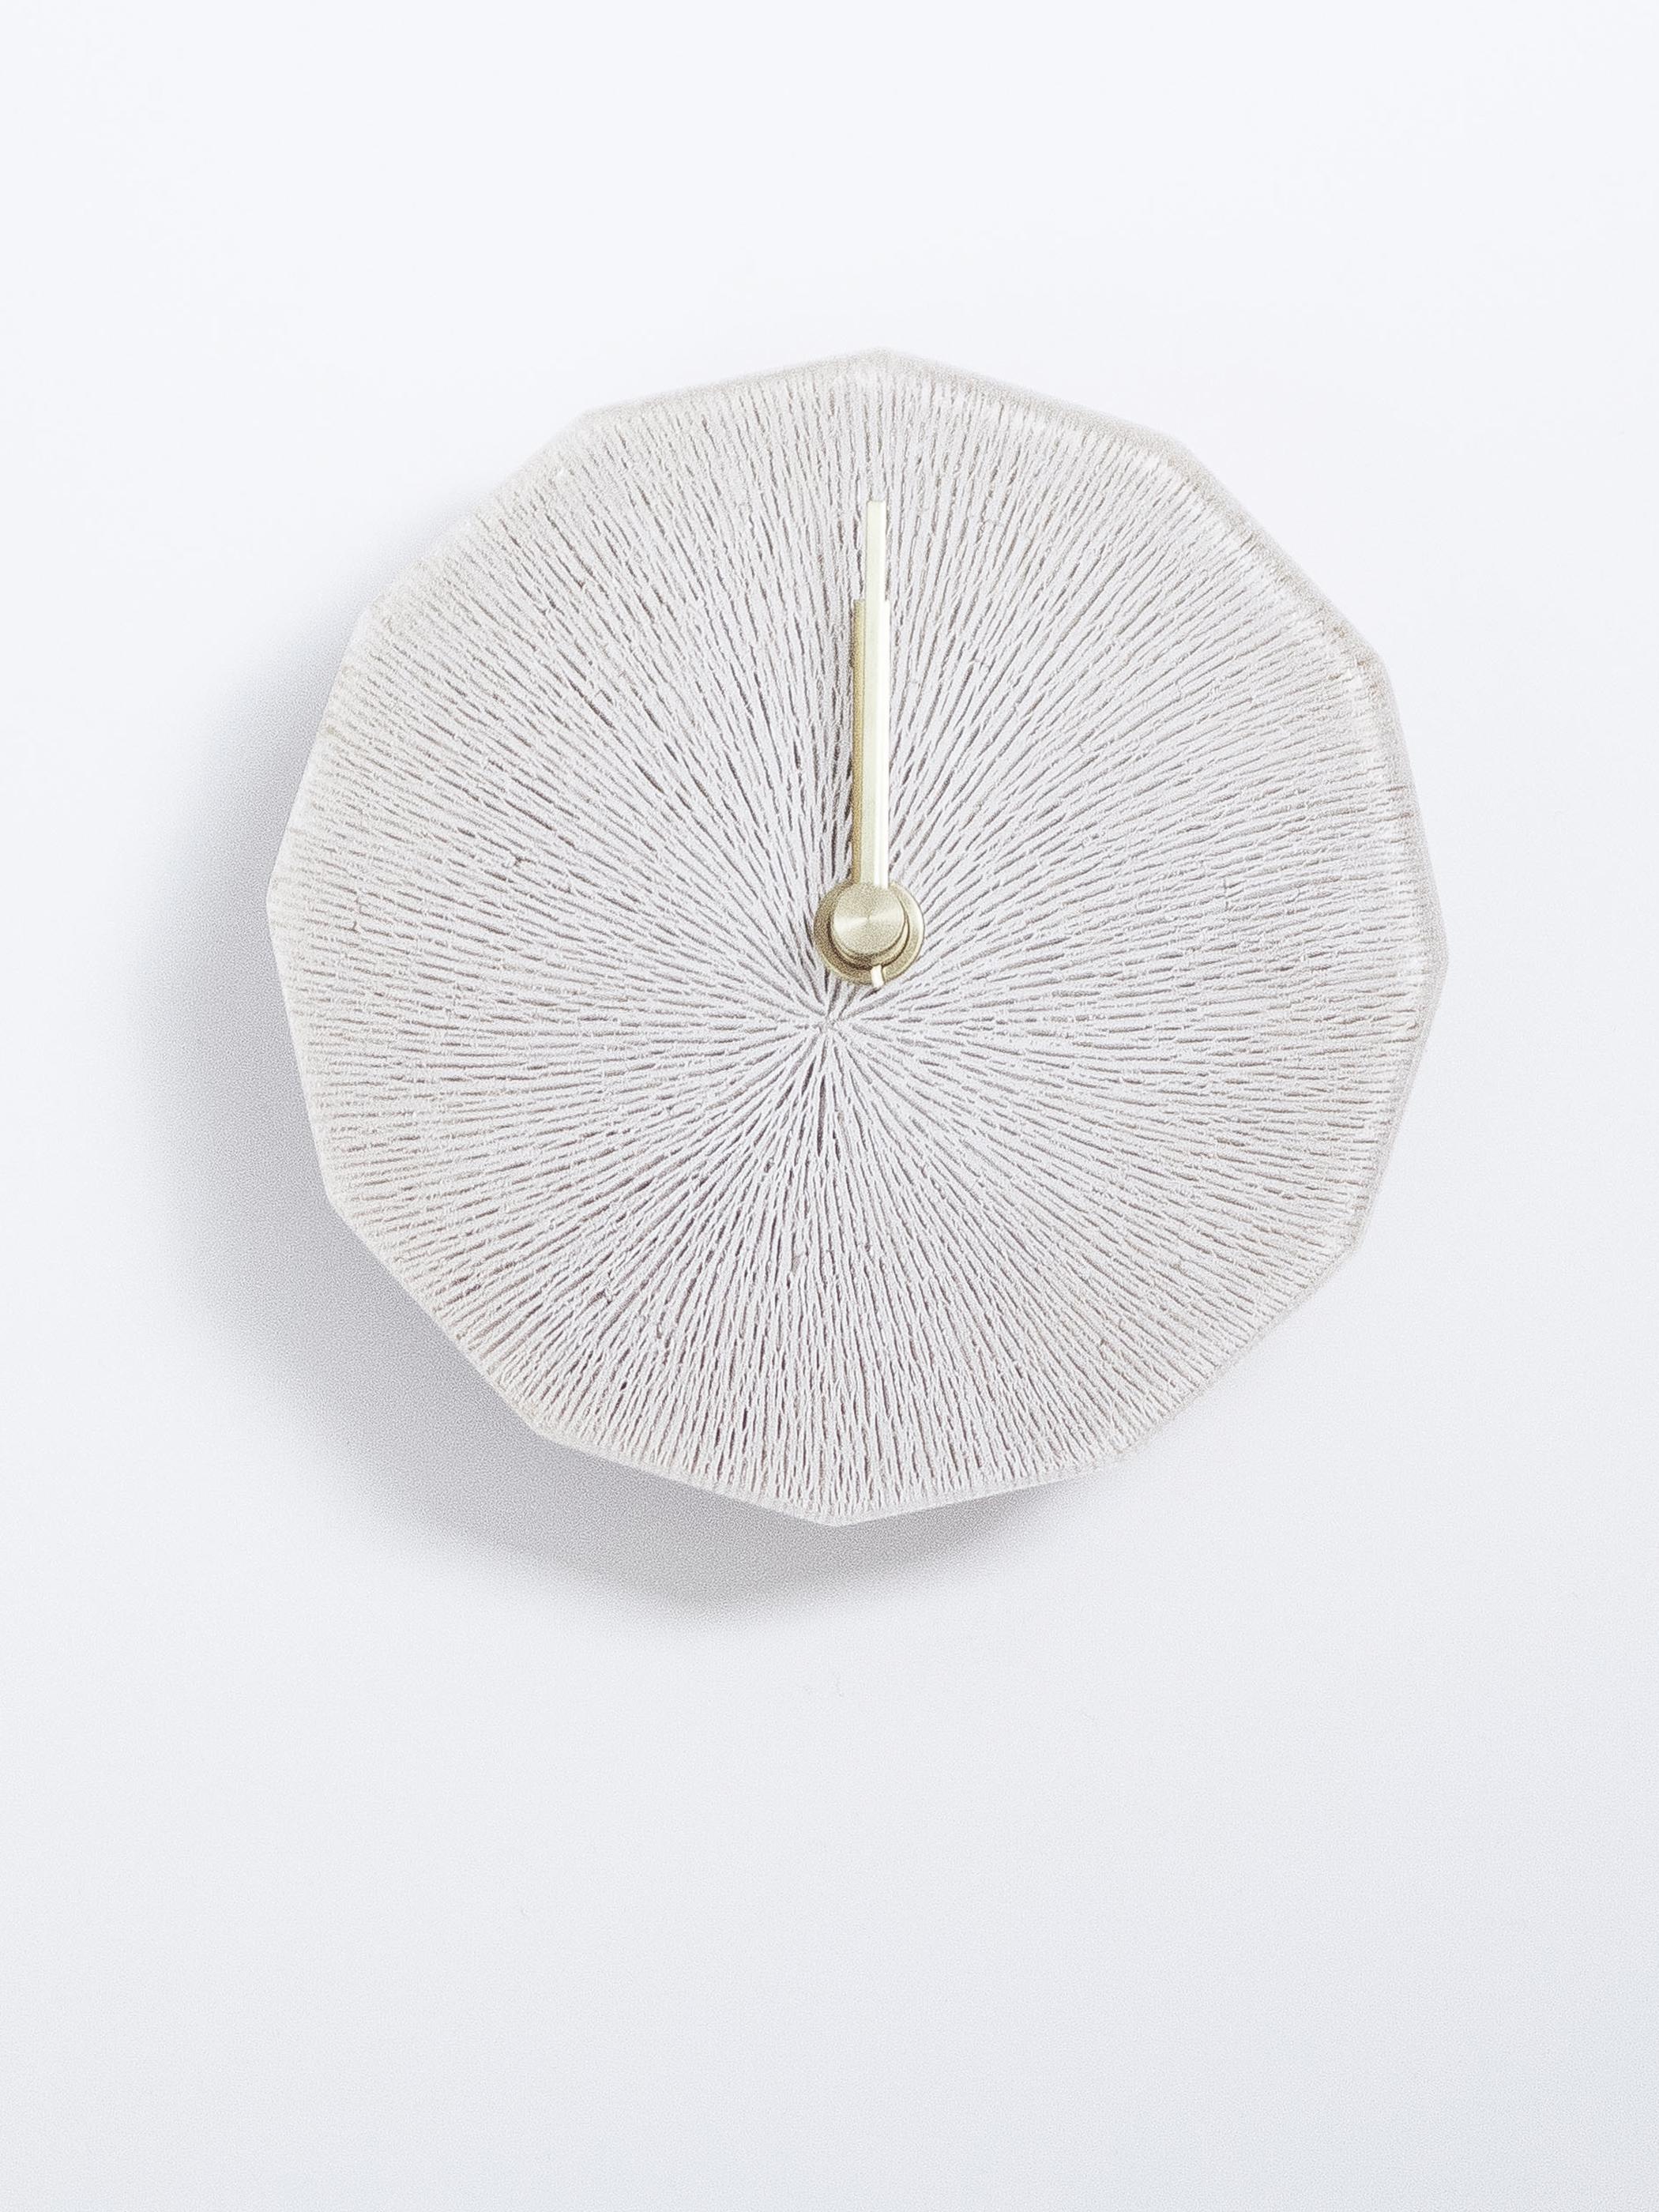 OO:WW clock 12 sided polygon